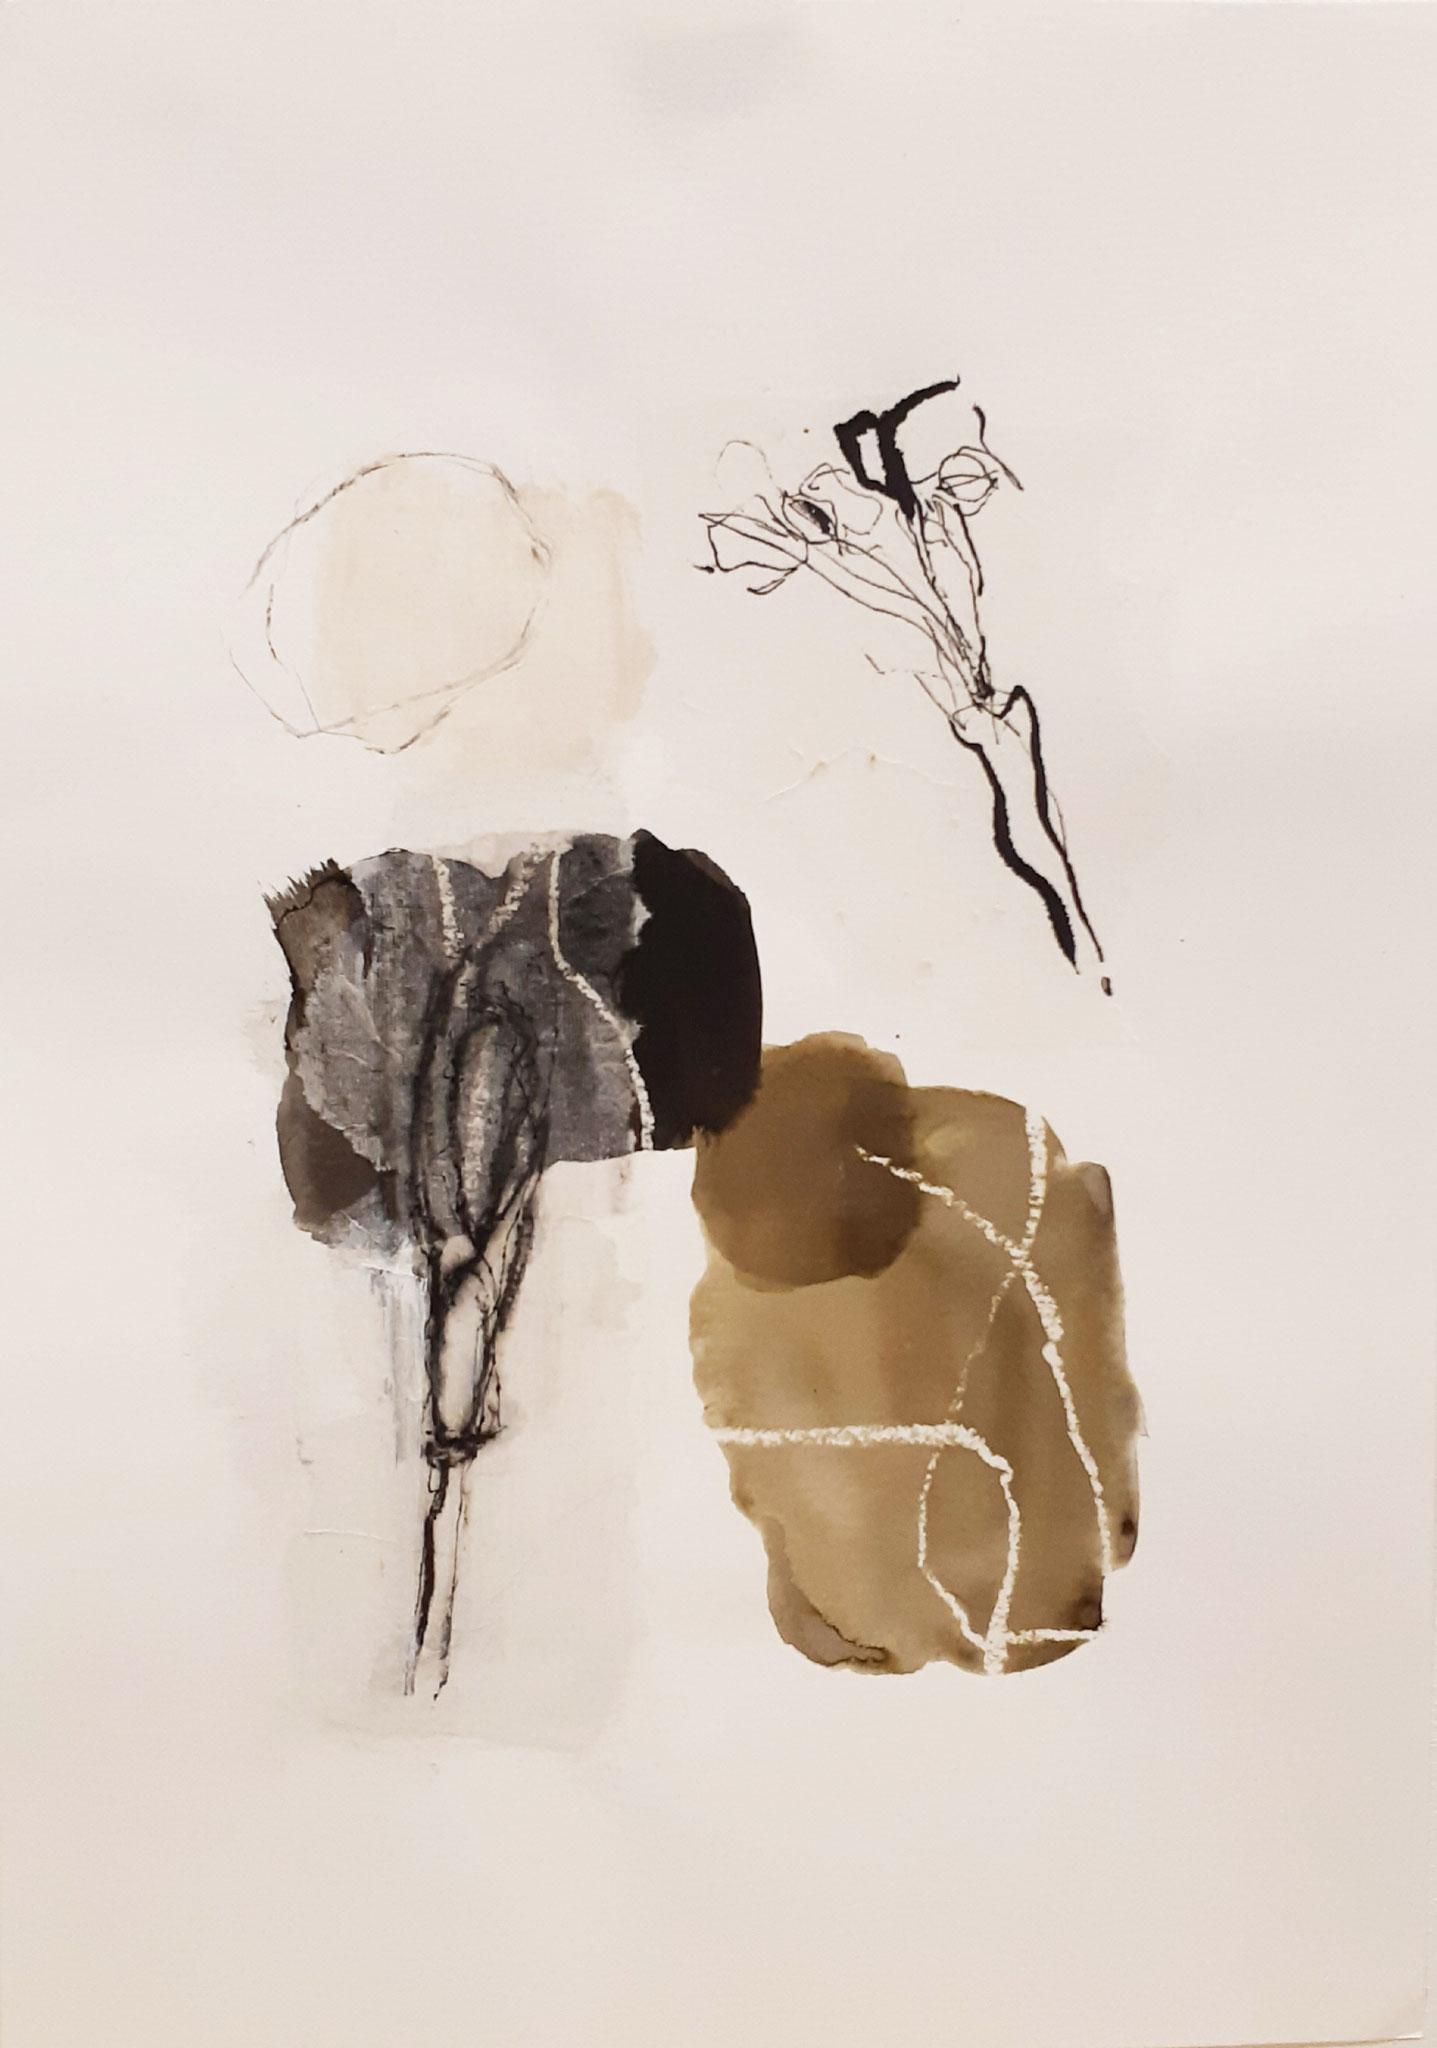 Mixed media auf Papier / on paper  30 x 40 cm